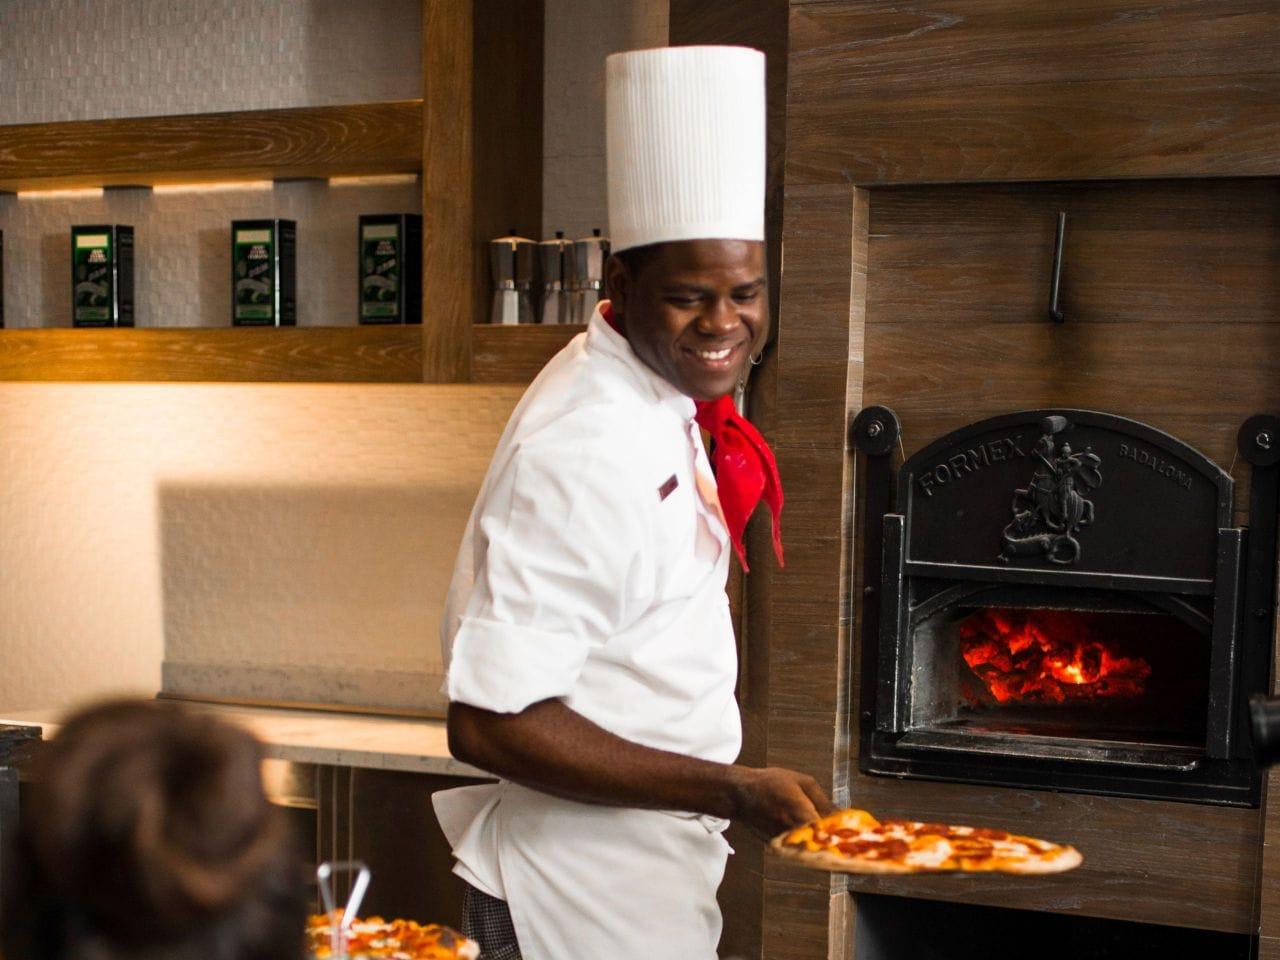 Chef removing pizza from oven at Di RoZa Italian Restaurant at Hyatt Ziva Rose Hall